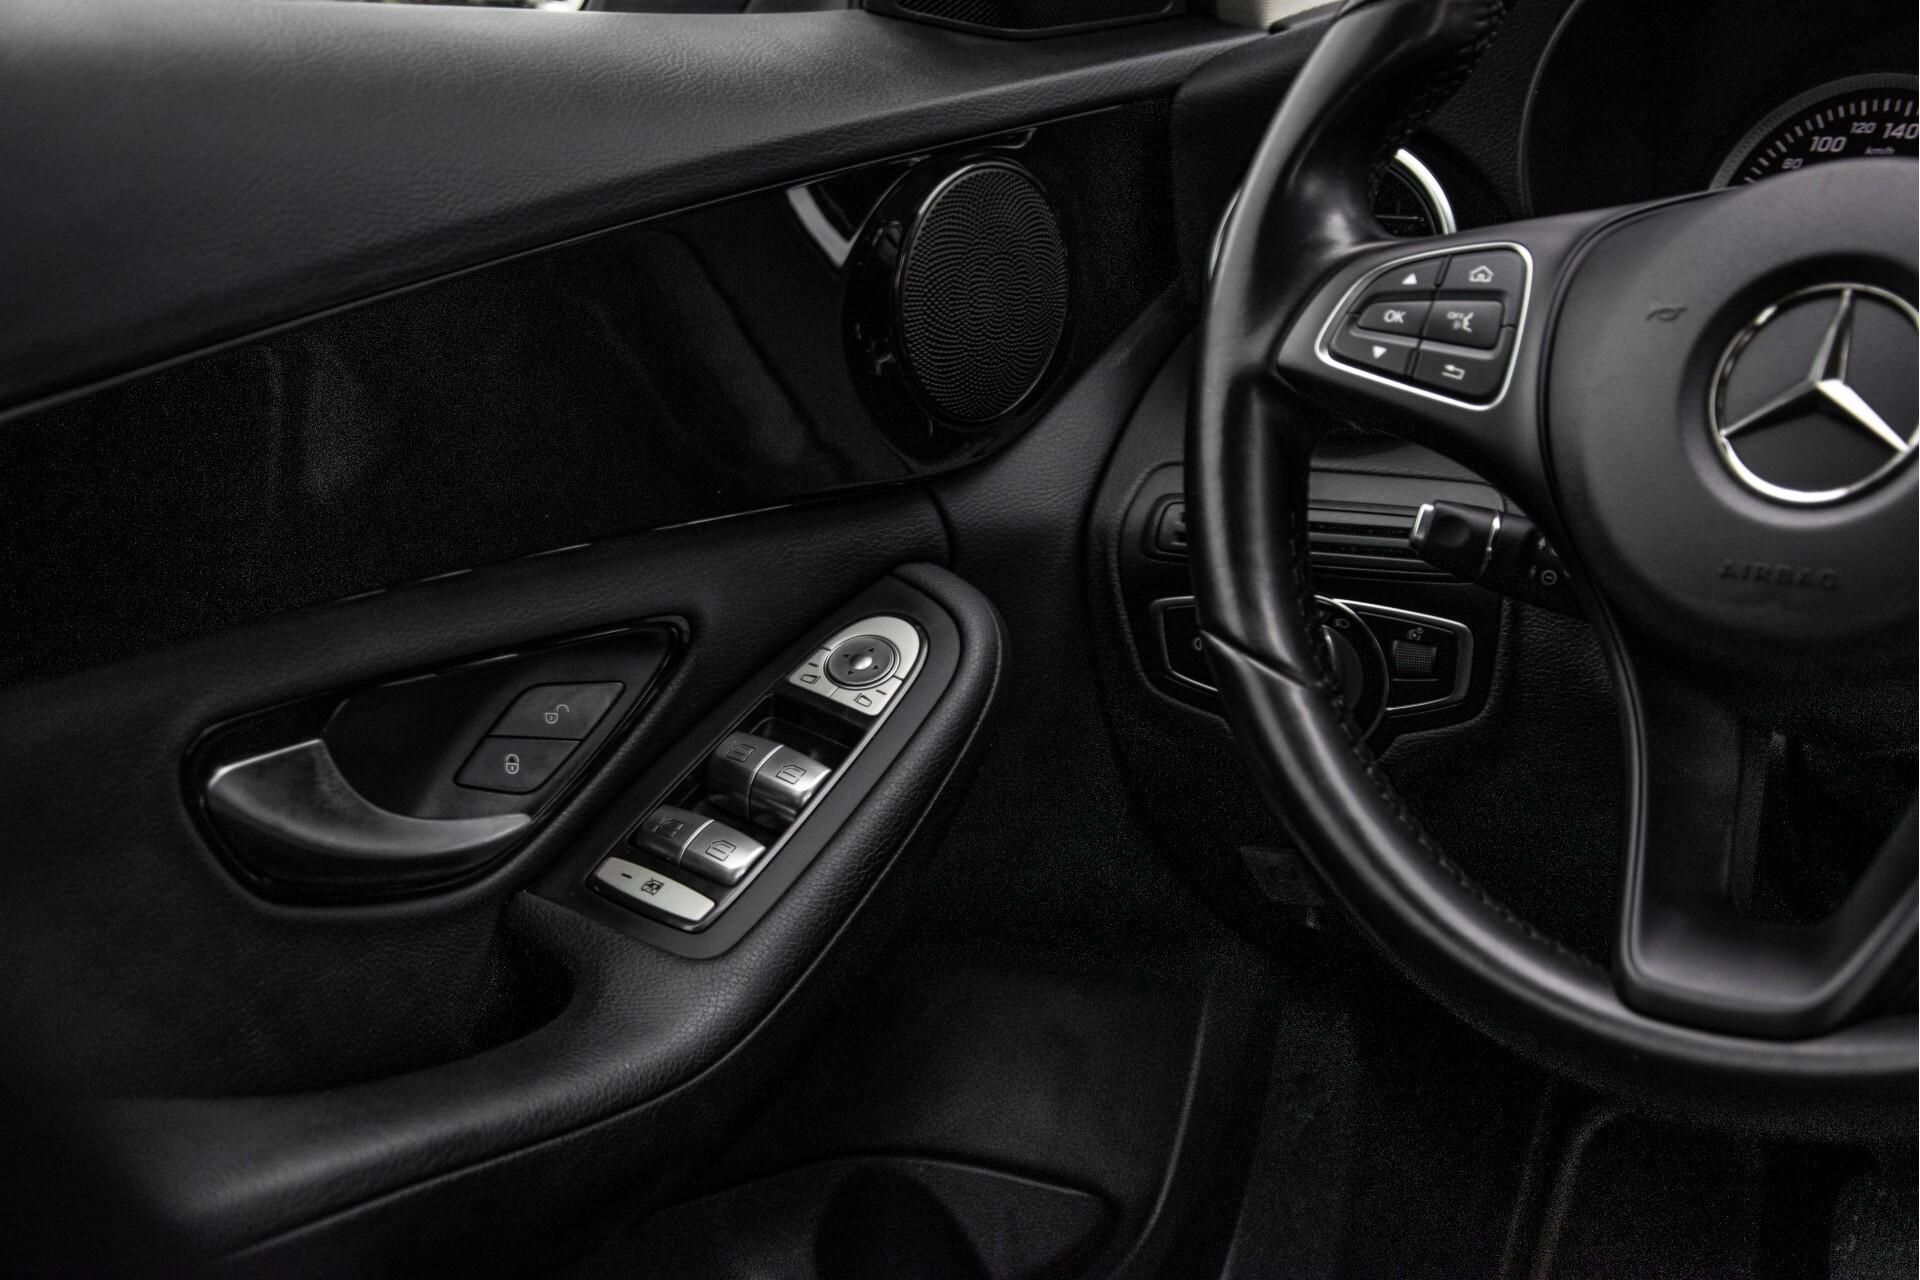 Mercedes-Benz C-Klasse 180 Bluetec Lease Edition Intelligent Light System/Cruise Control/Navi Foto 36